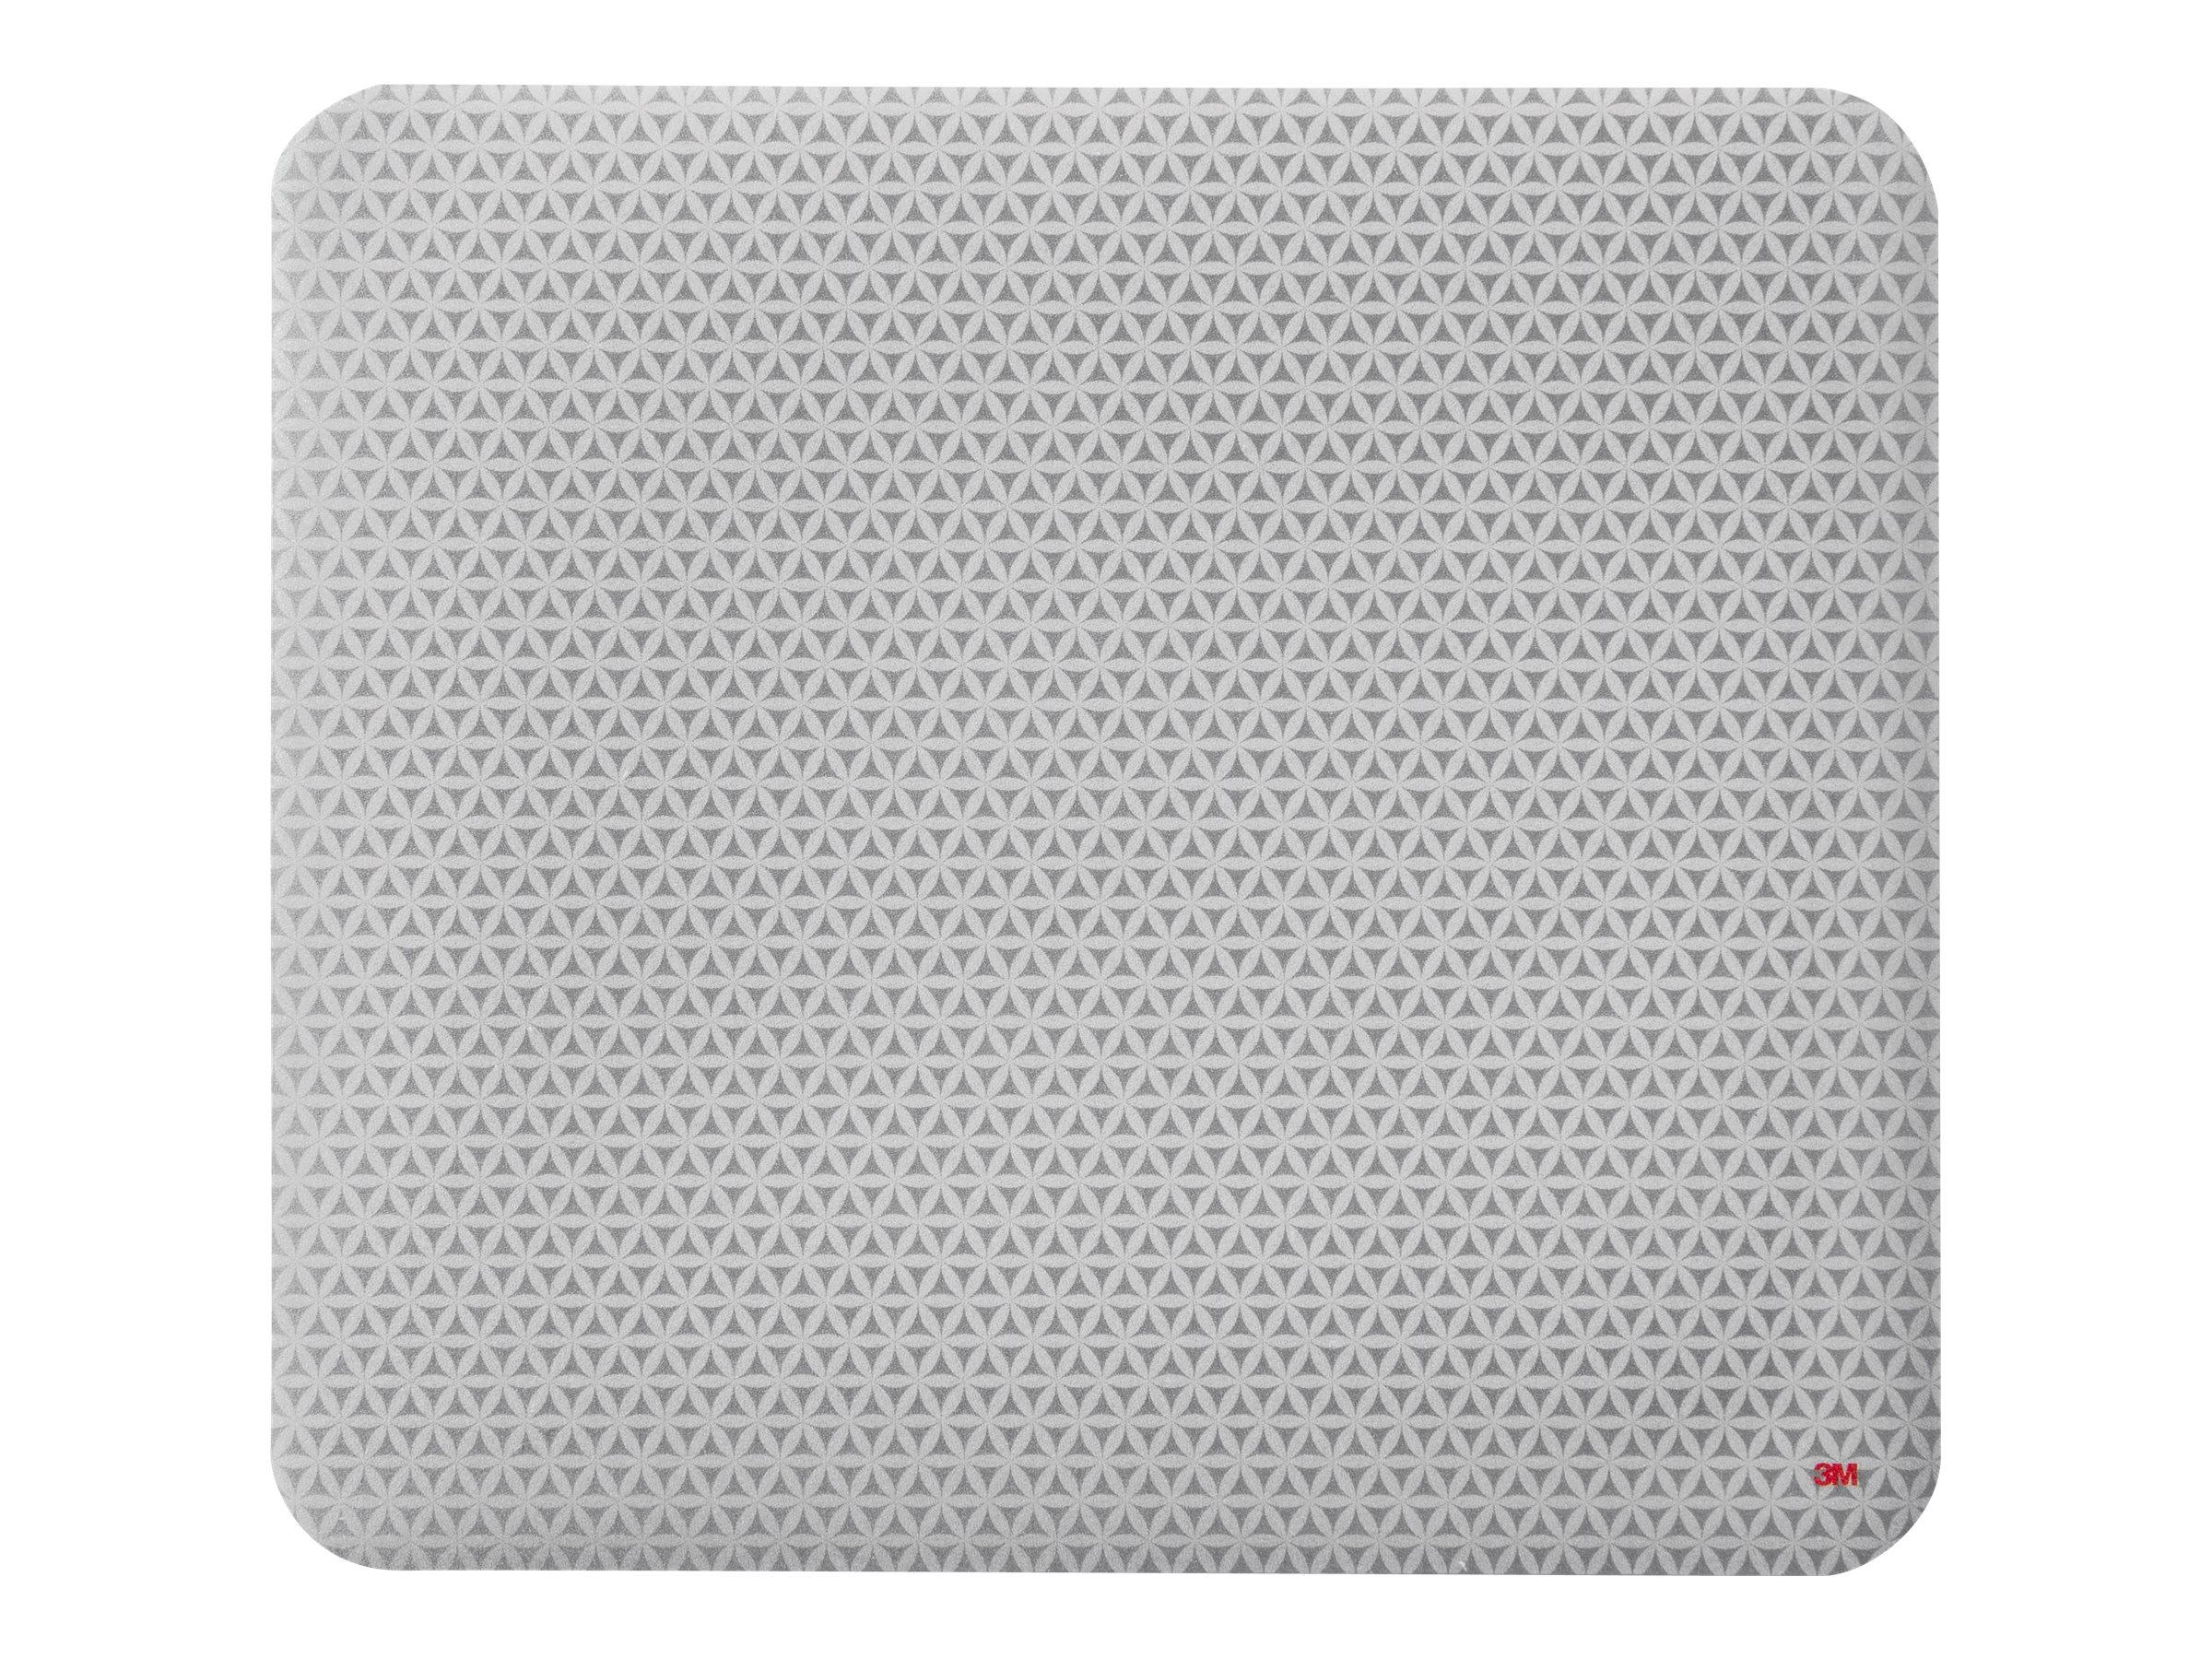 3M Precise Battery Saving Design-Bitmap Non-skid Backing MP114-BSD1 - mouse pad